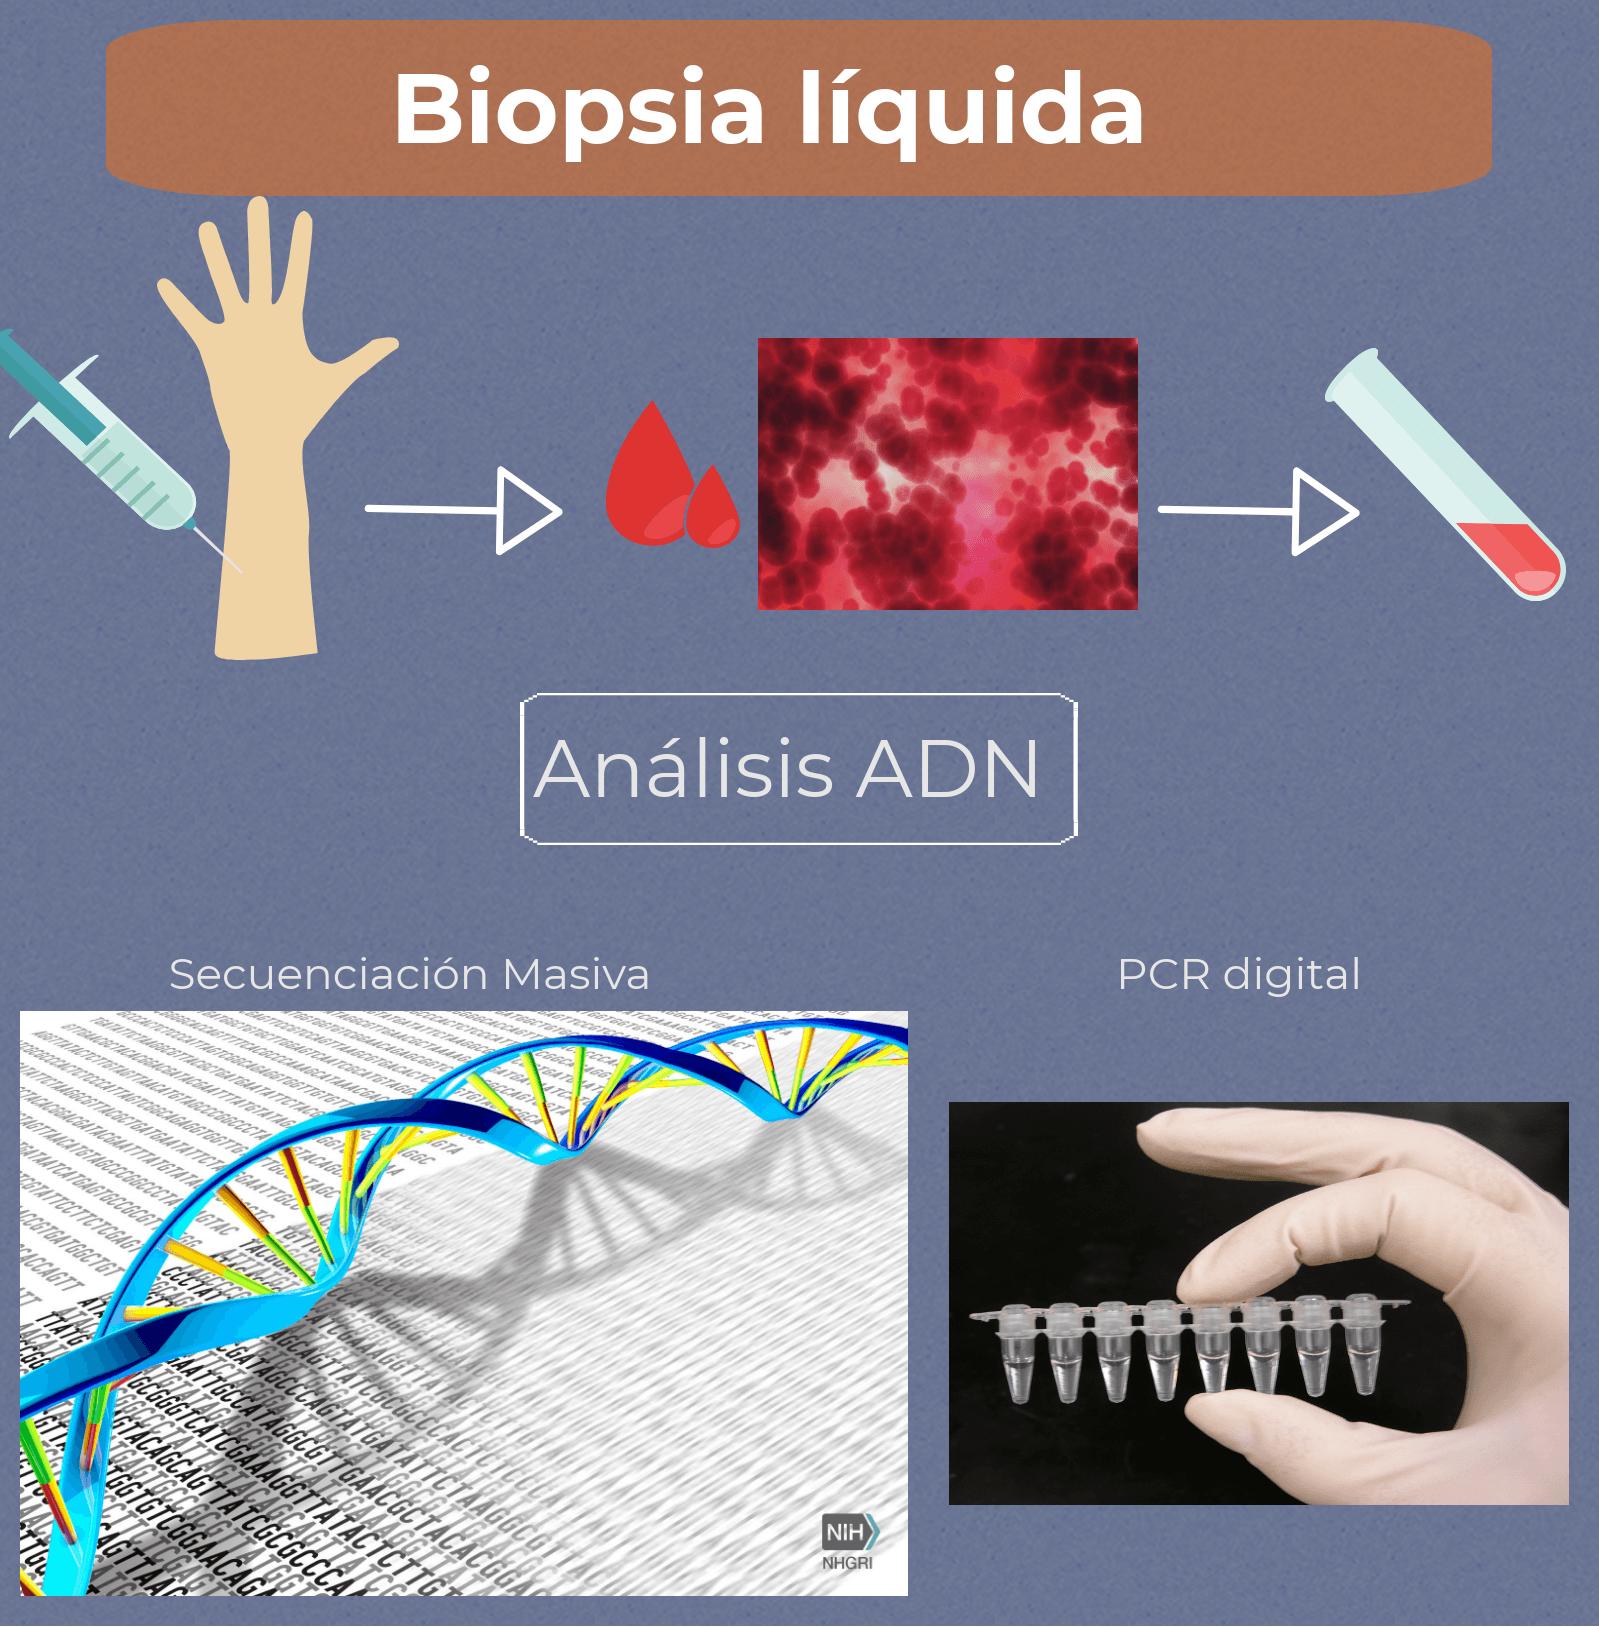 biopsia líquida